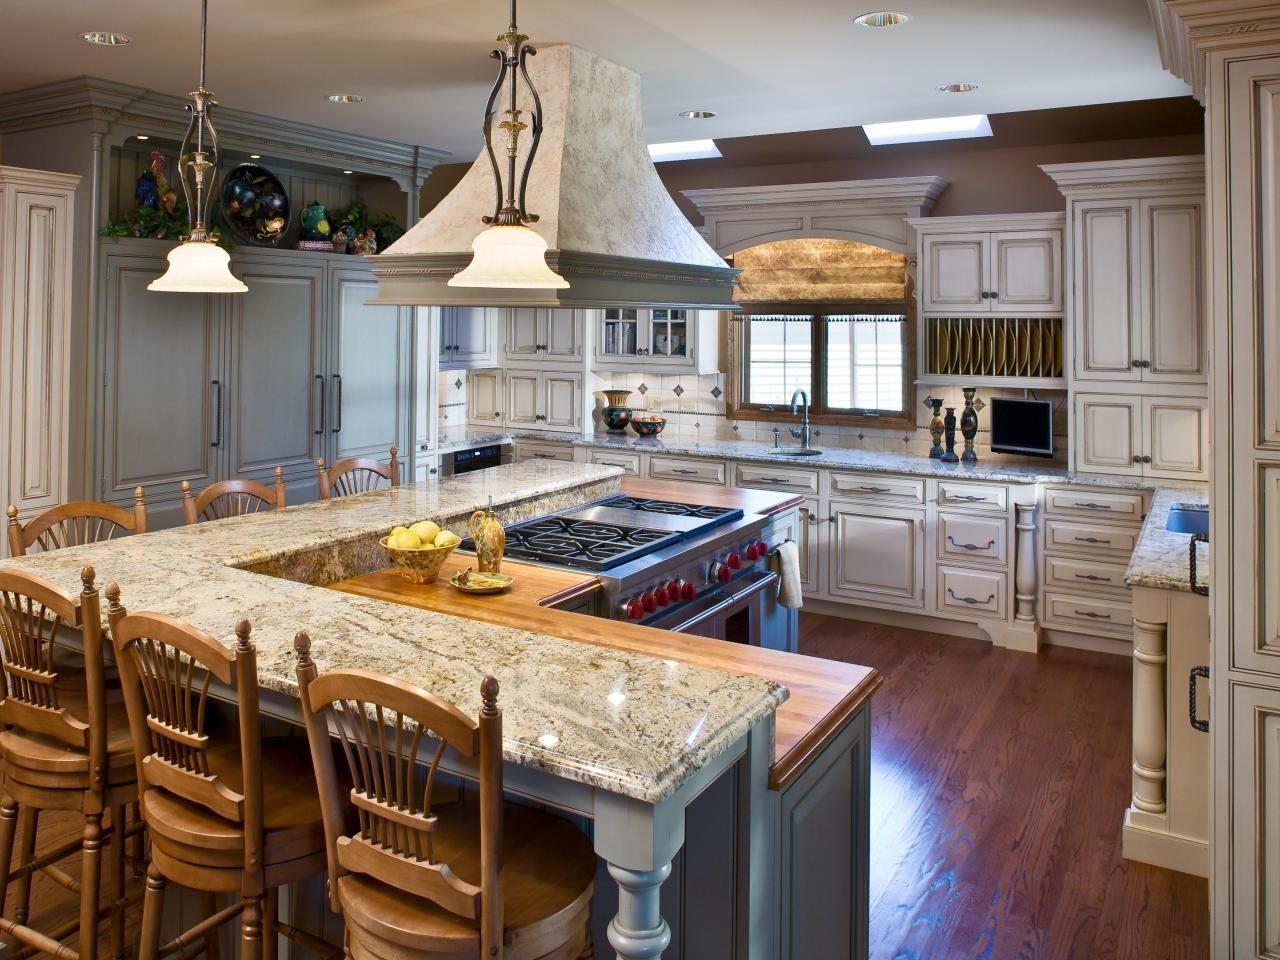 Kitchenlayouttemplates6Differentdesignshgtvpertainingtol Adorable L Shaped Kitchen Island Inspiration